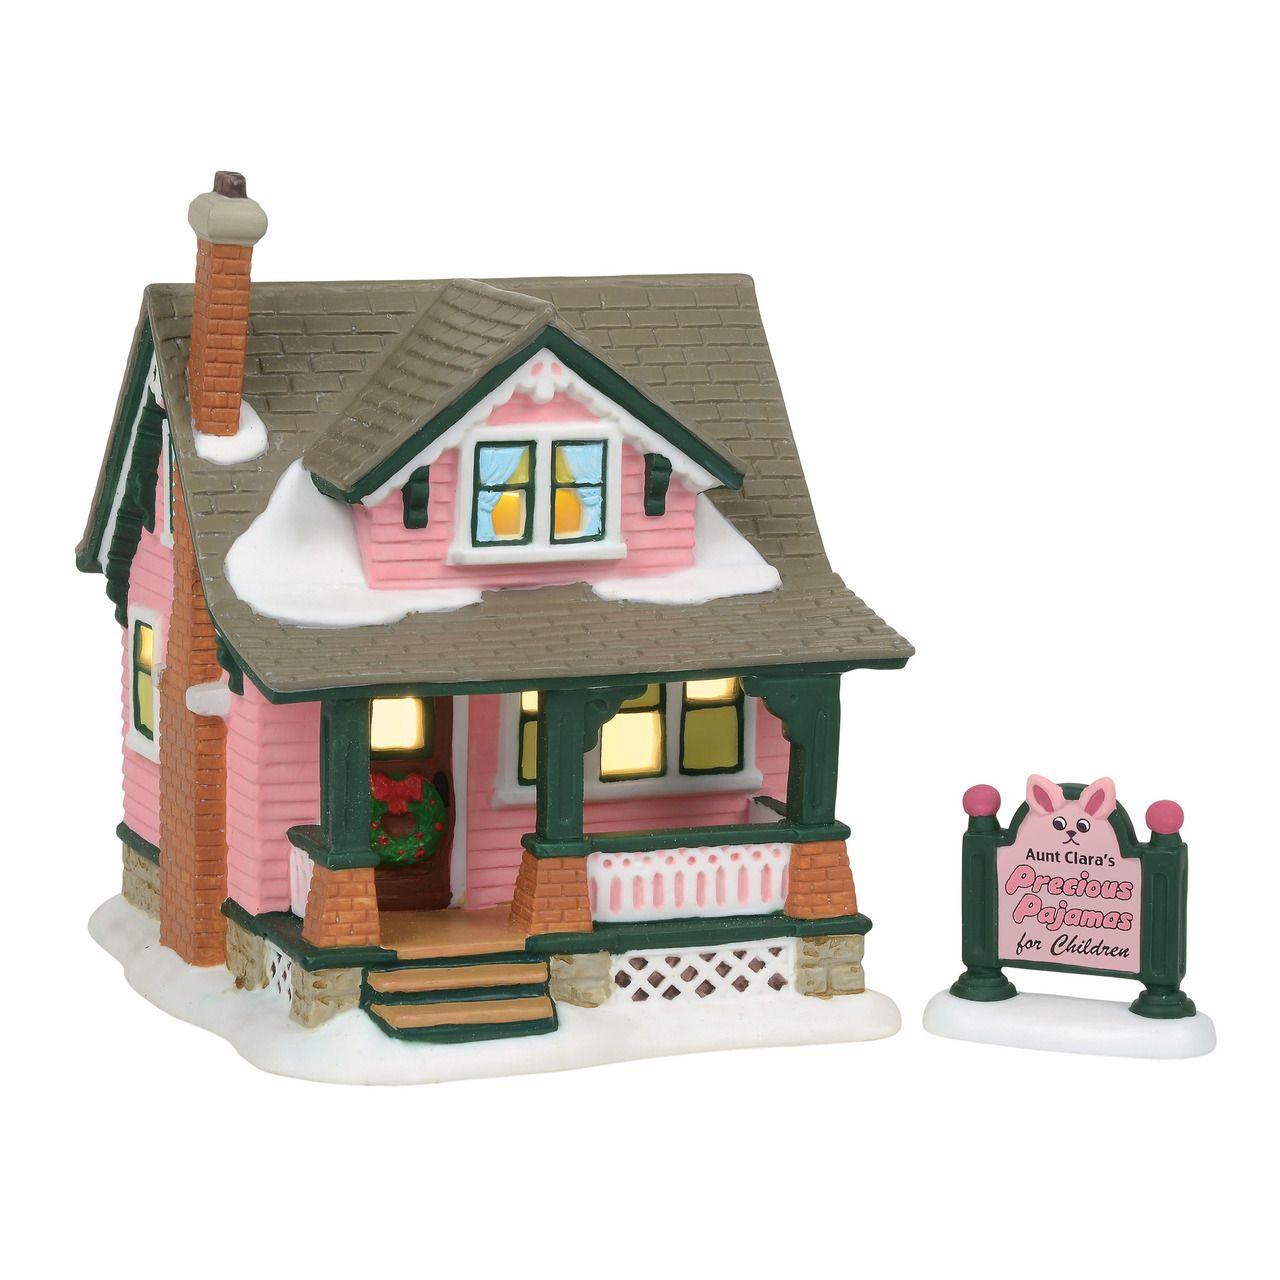 Department 56 A Christmas Story Village Aunt Clara's House Building 6001185 #department56